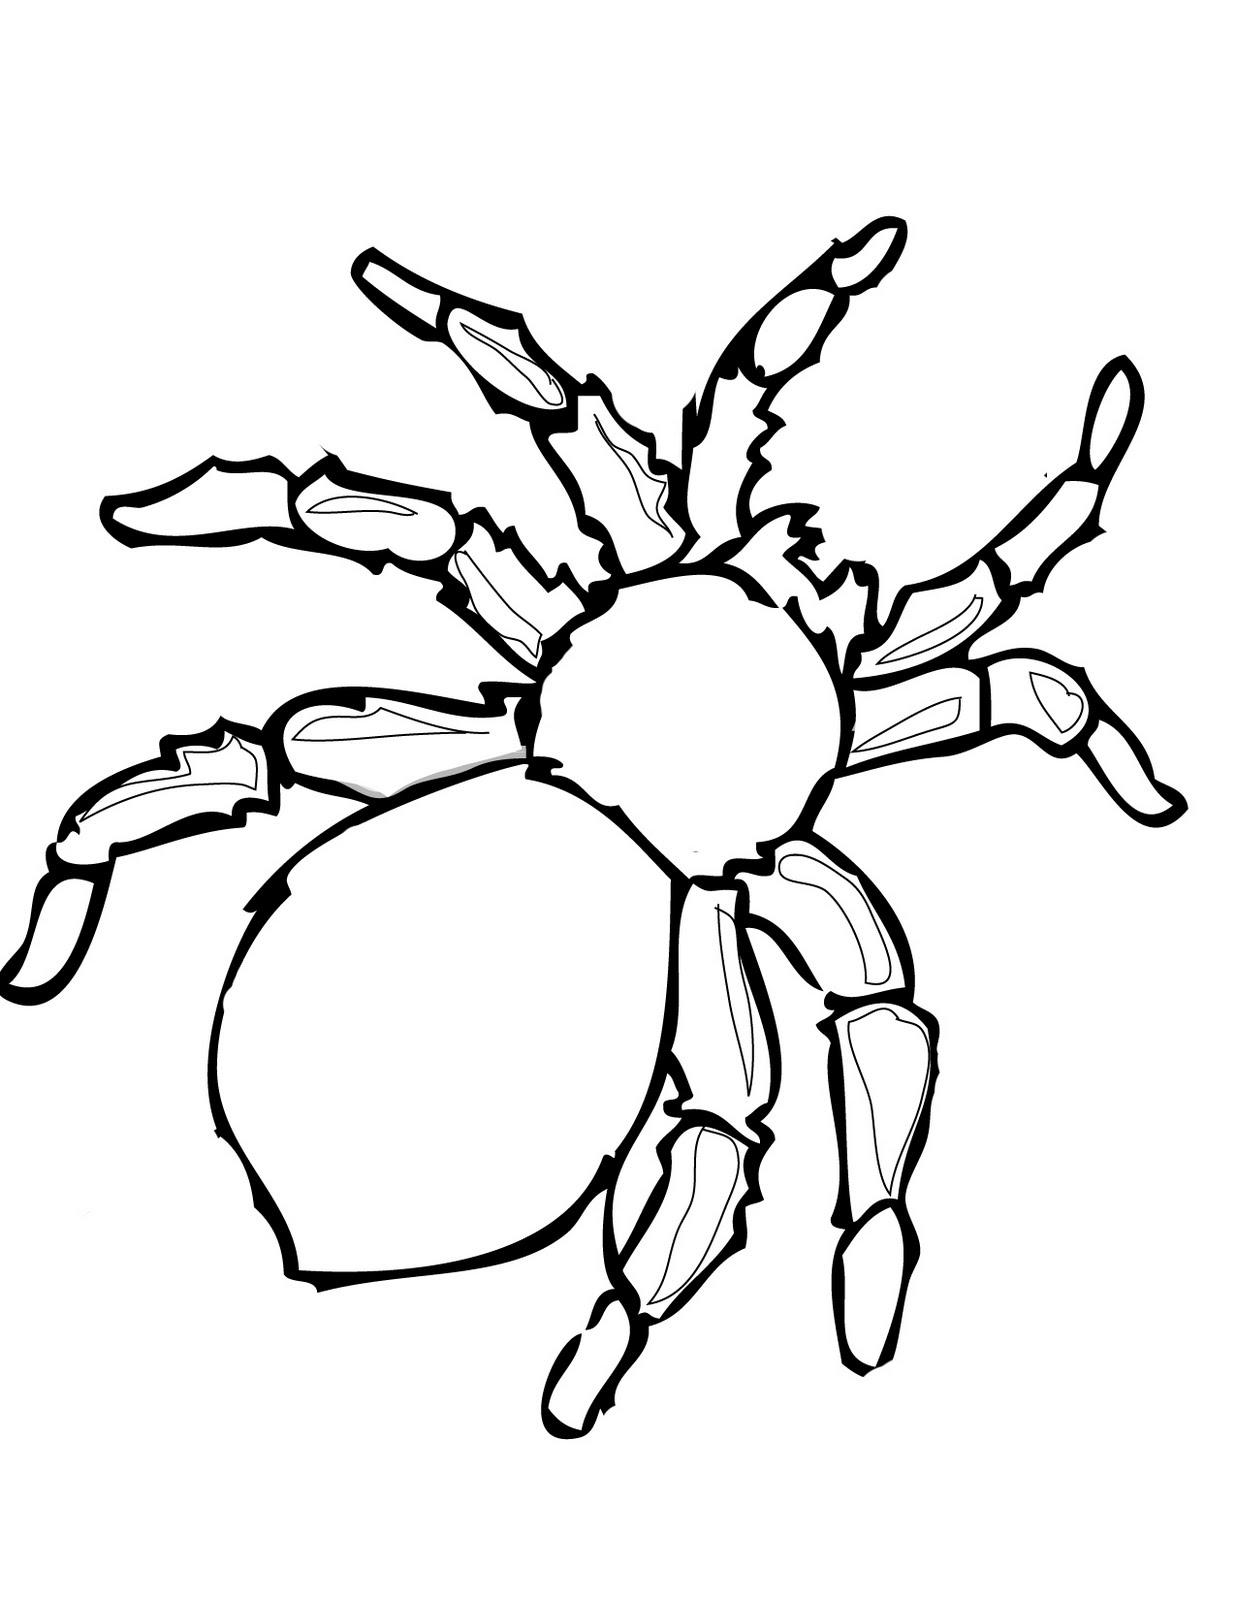 1236x1600 Spider Web Outline